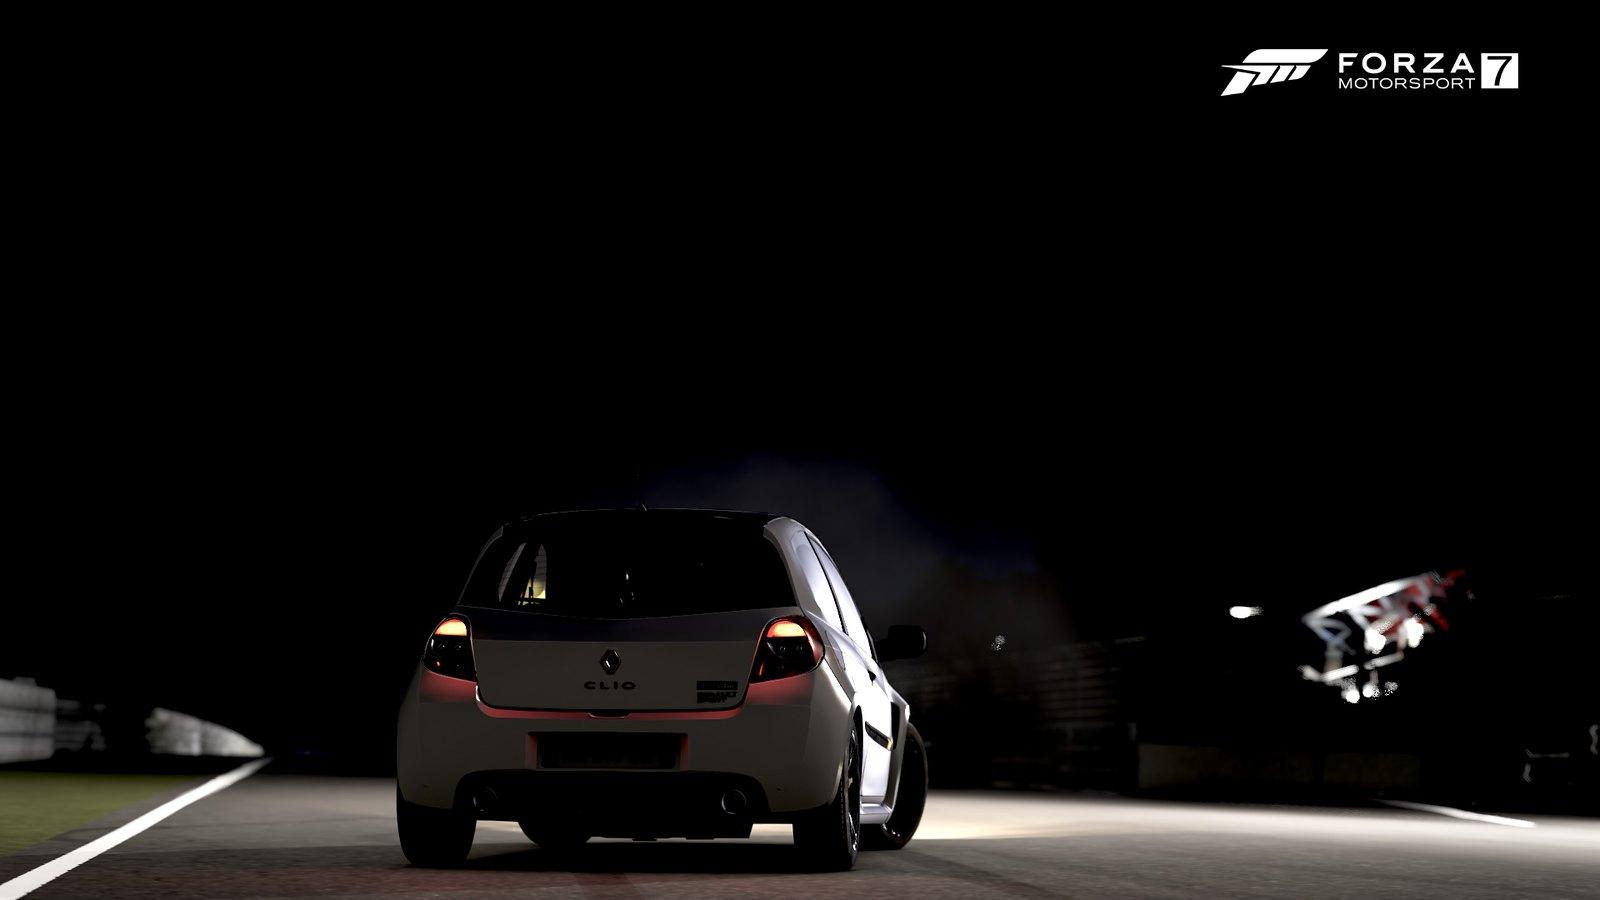 39935497161_9d995ec0a5_h ForzaMotorsport.fr